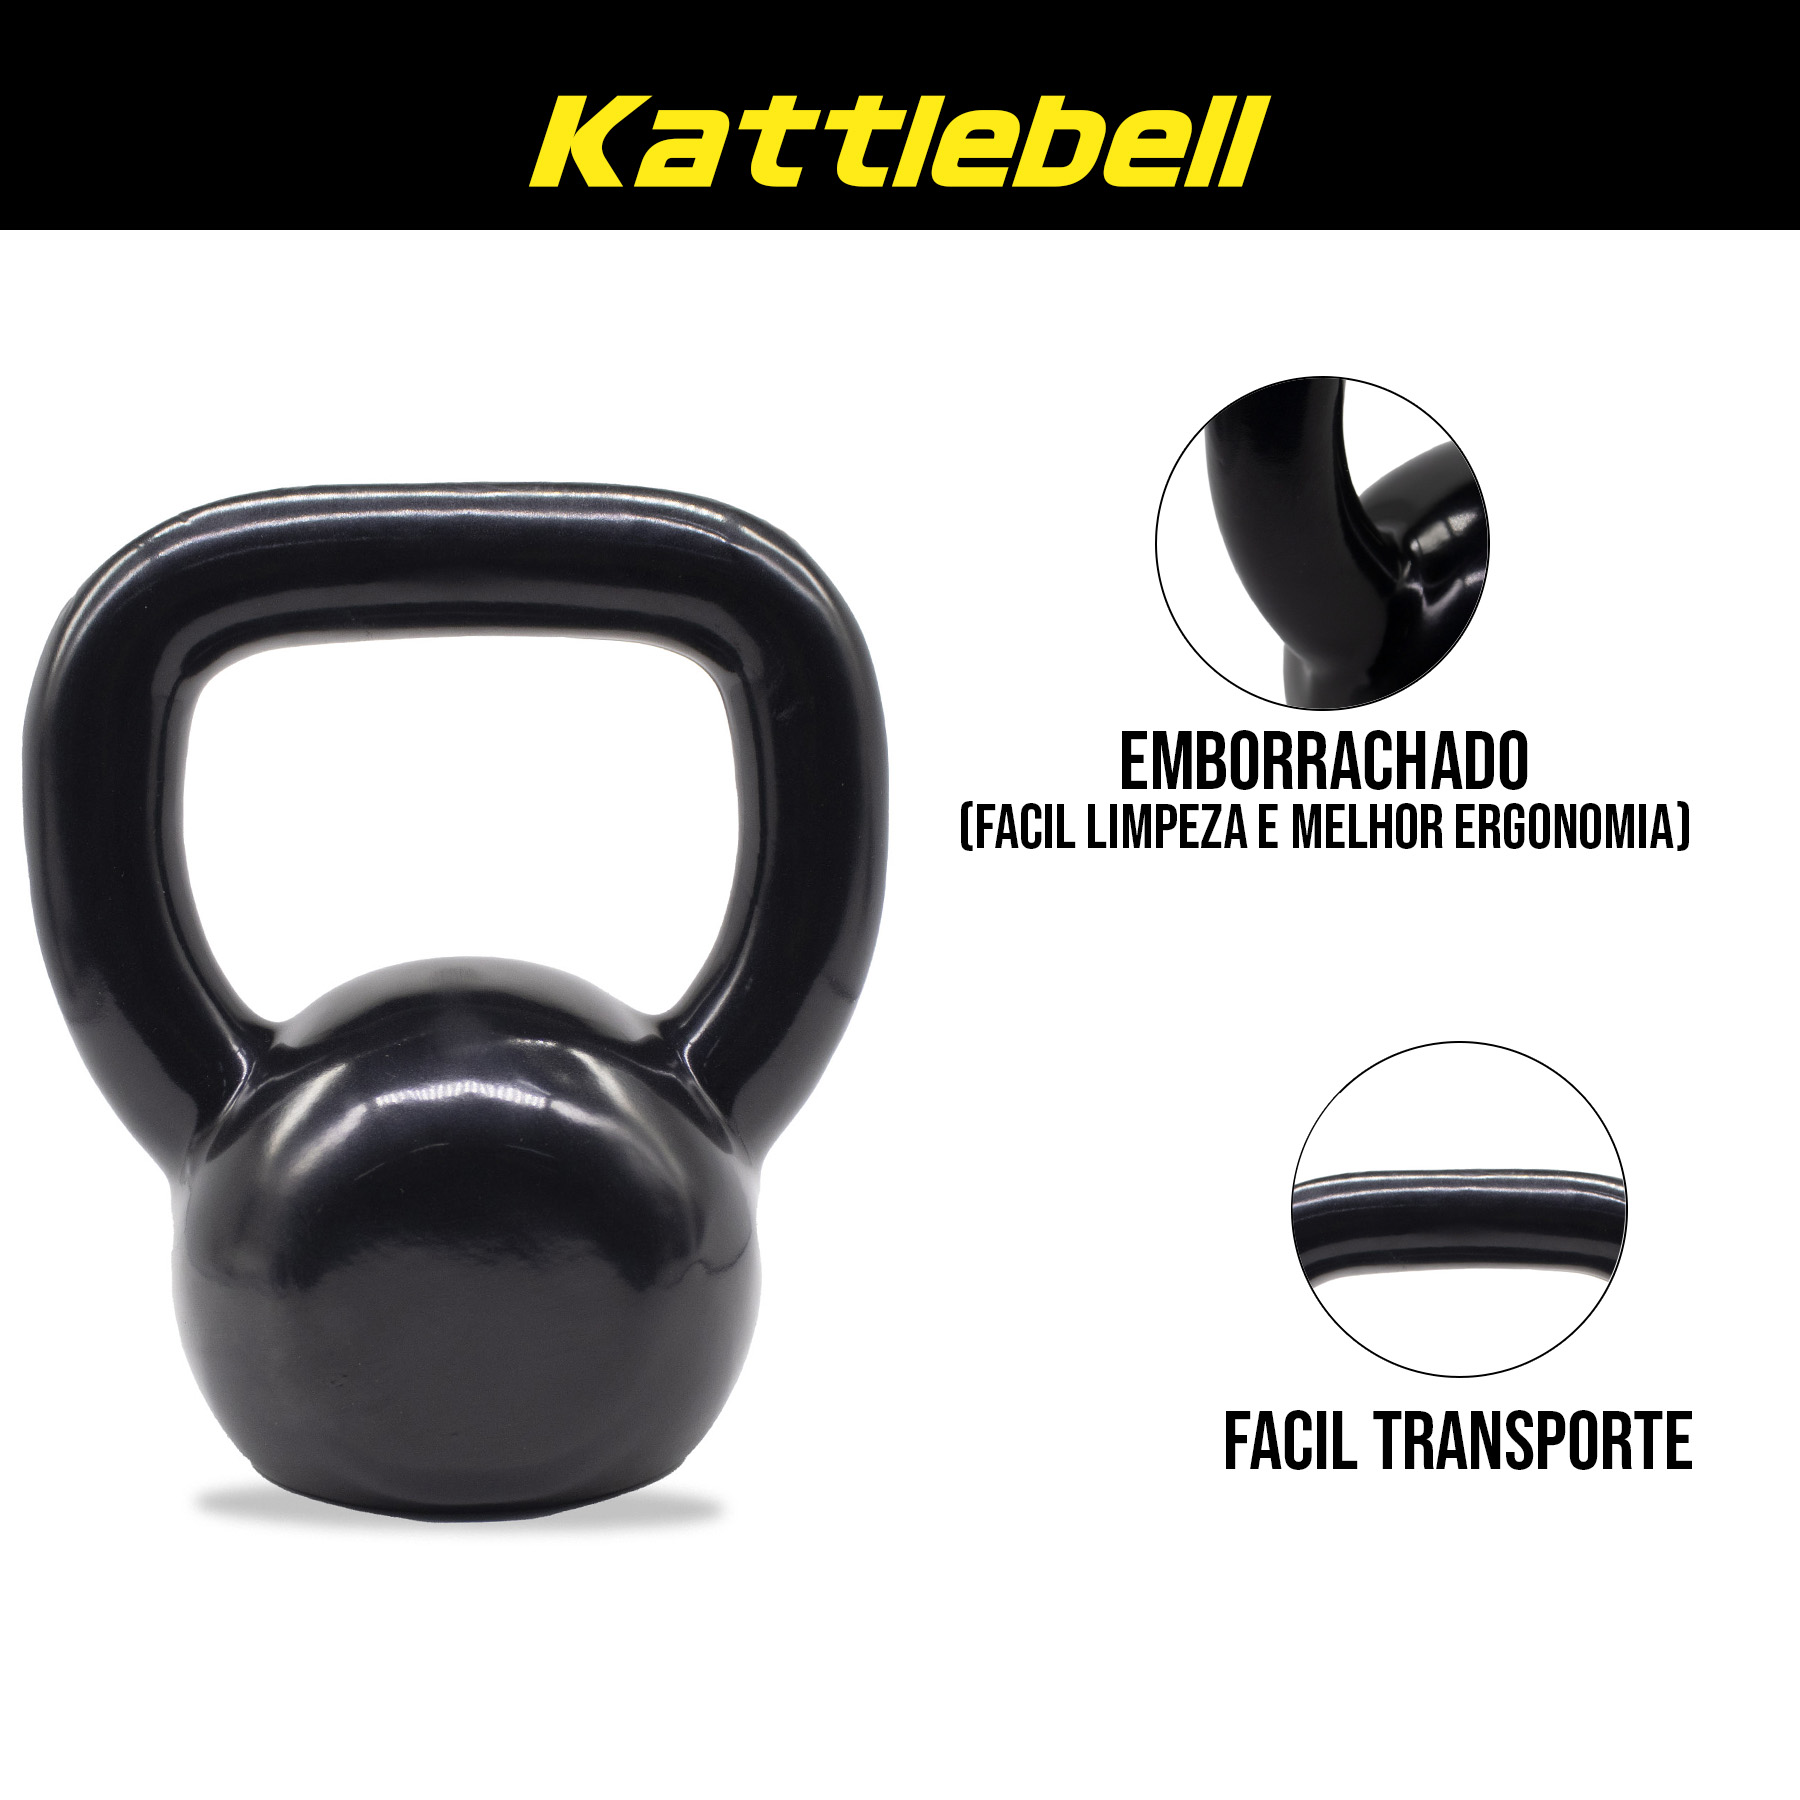 Kettlebell Emborrachado Peso:18KG